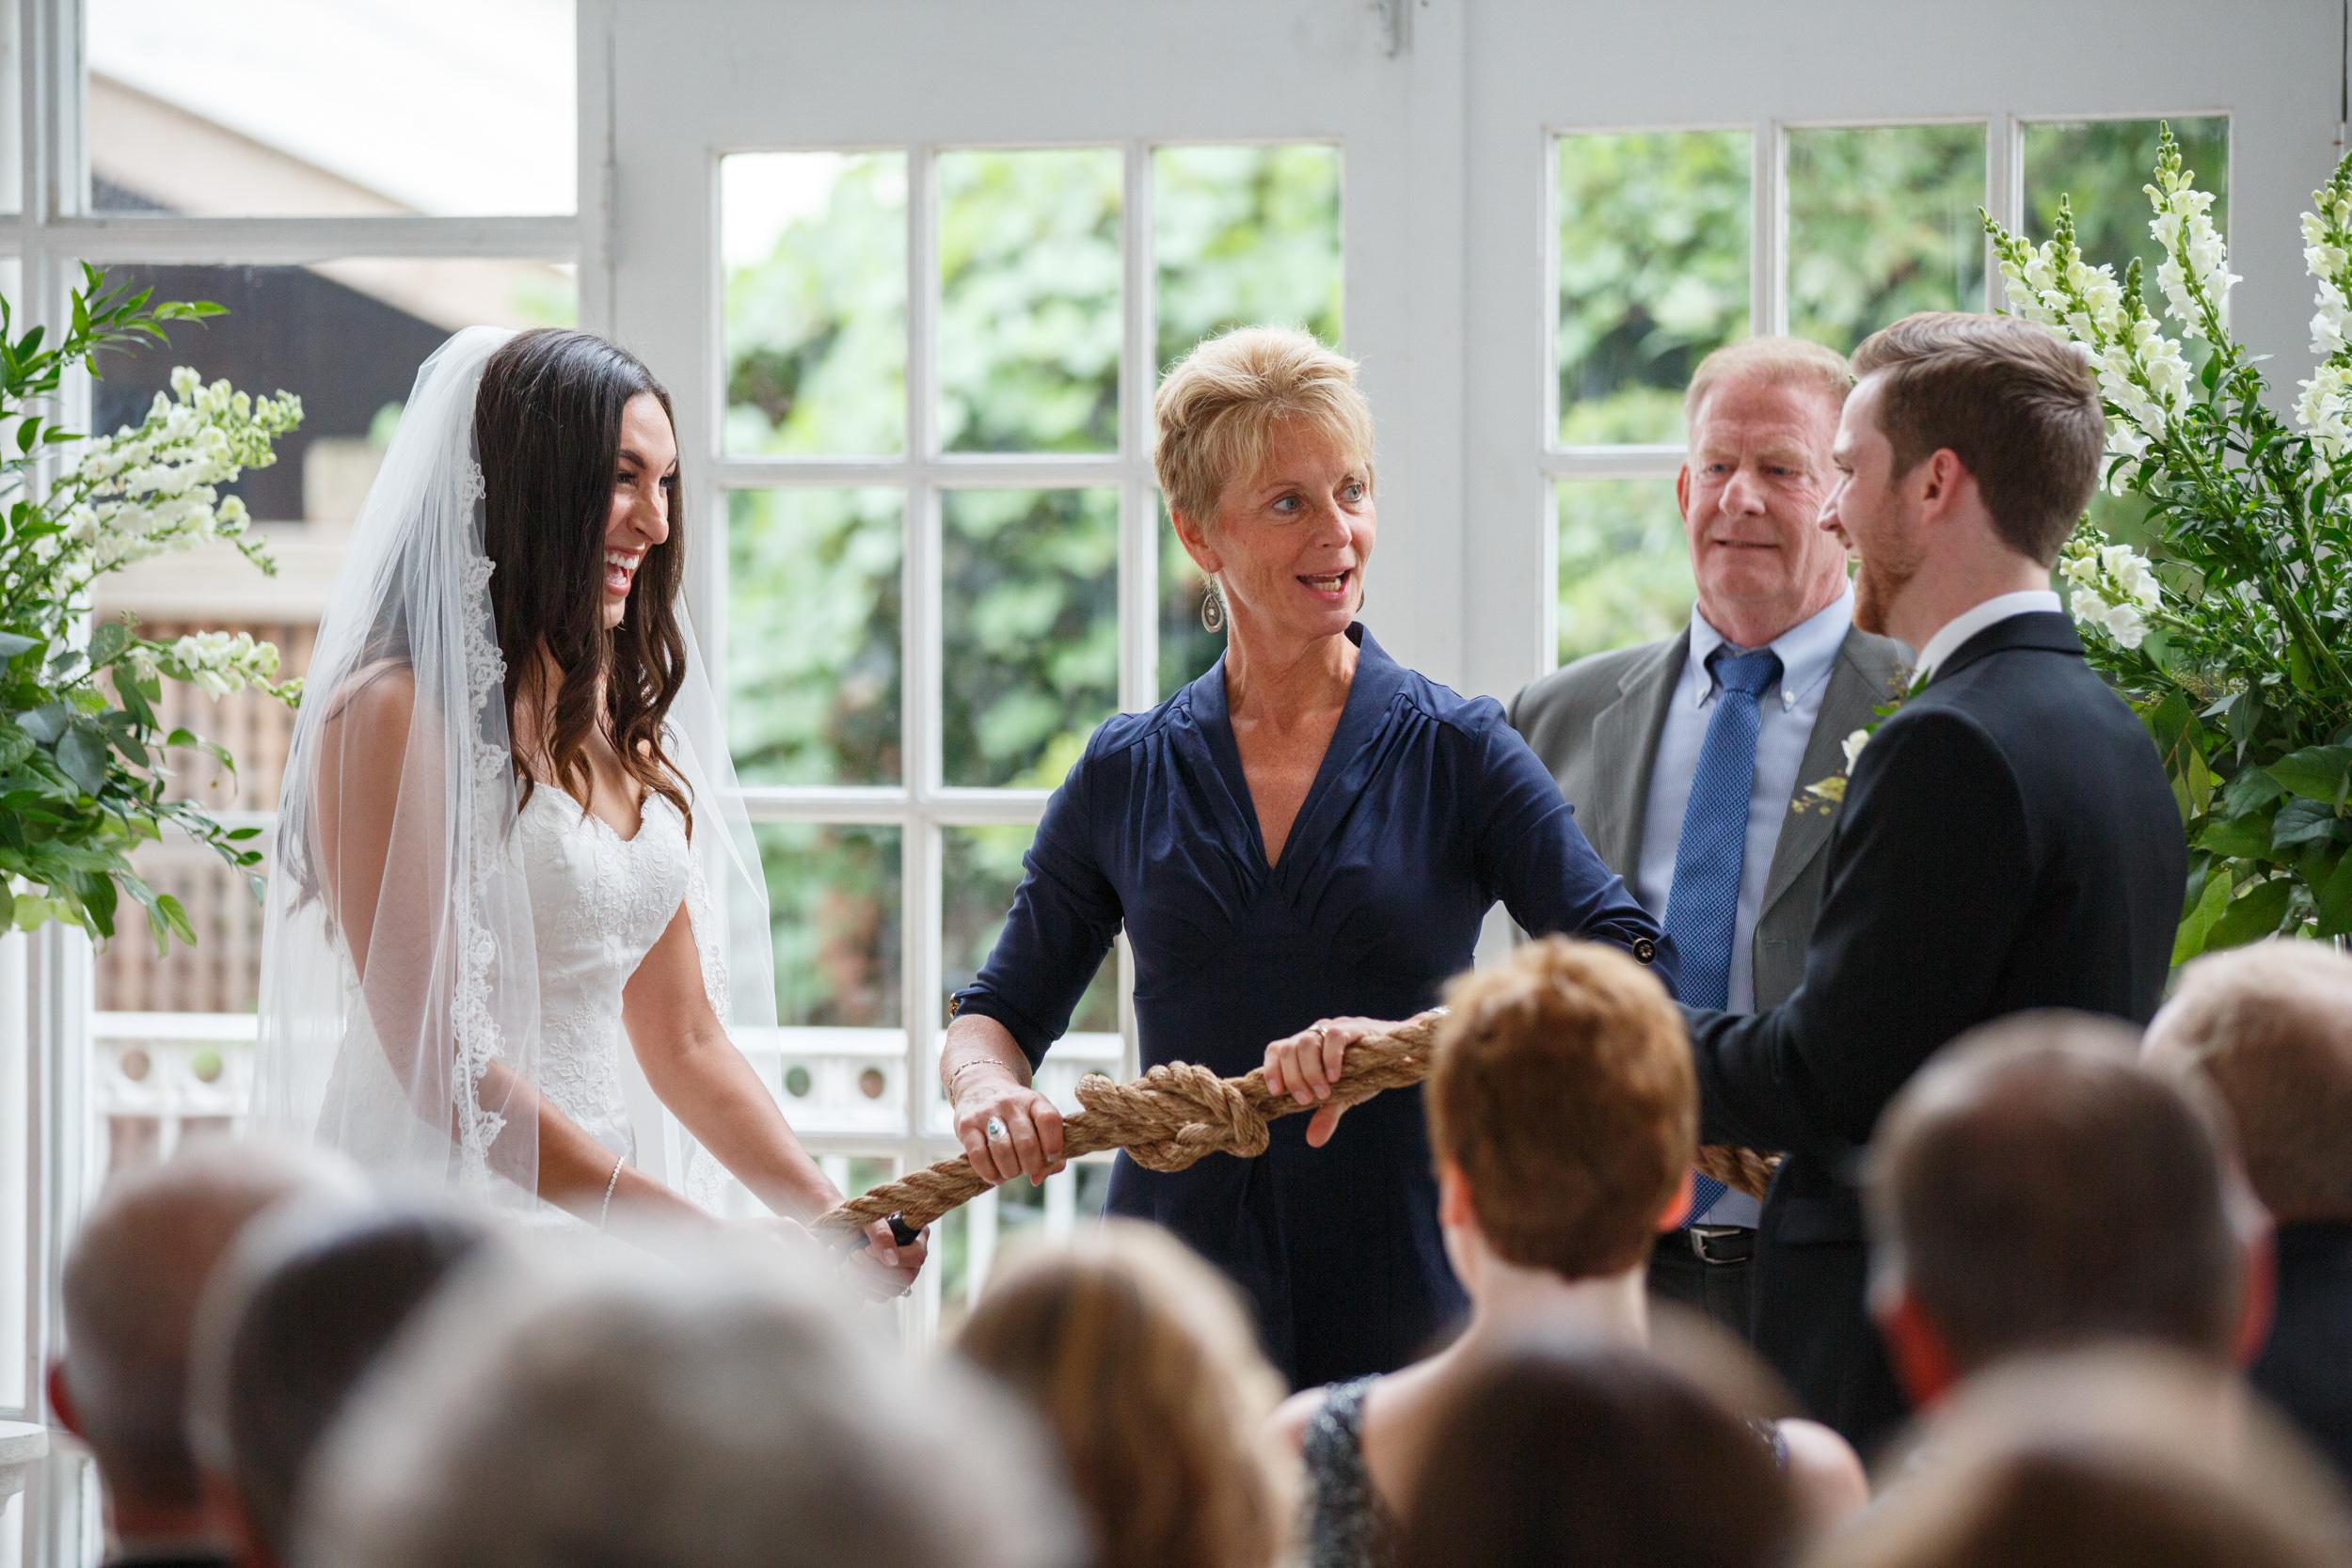 9-09-2016 Flora & Colin wedding photography by Brian Milo-153.jpg